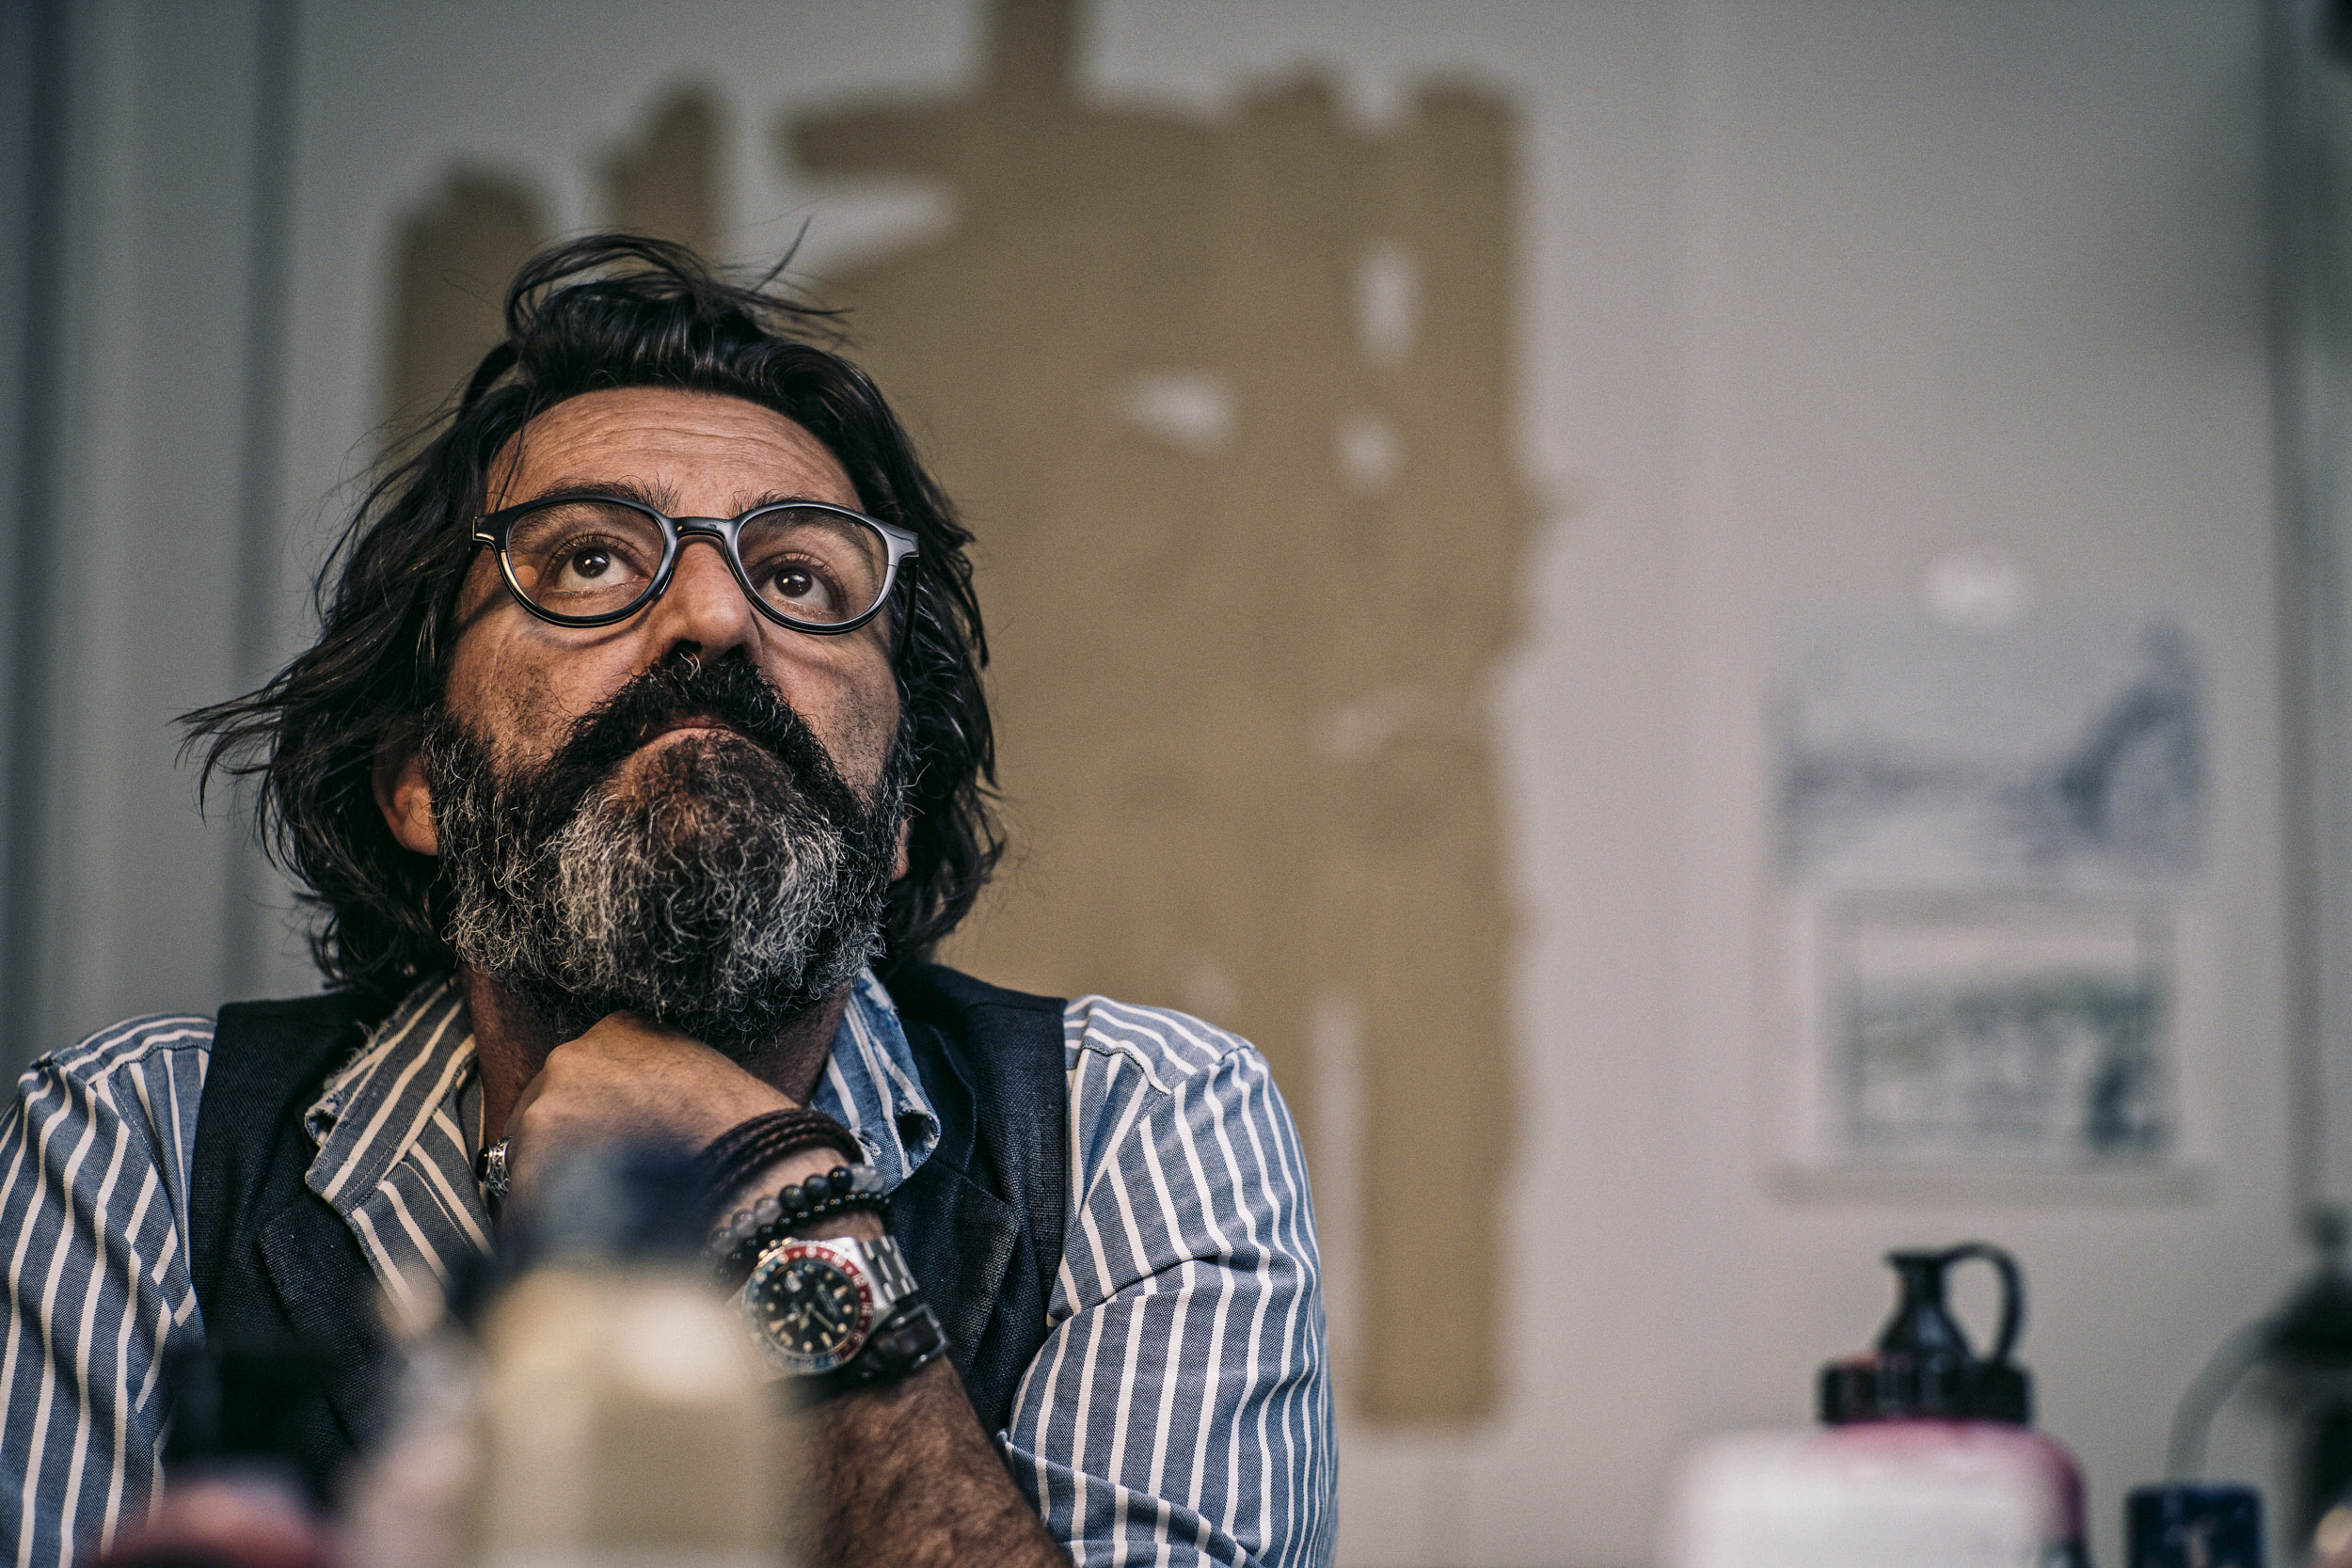 2018-SeifertUebler-Mauro-Bergonzoli-lifestyle-portrait-artist-photography-006.jpg